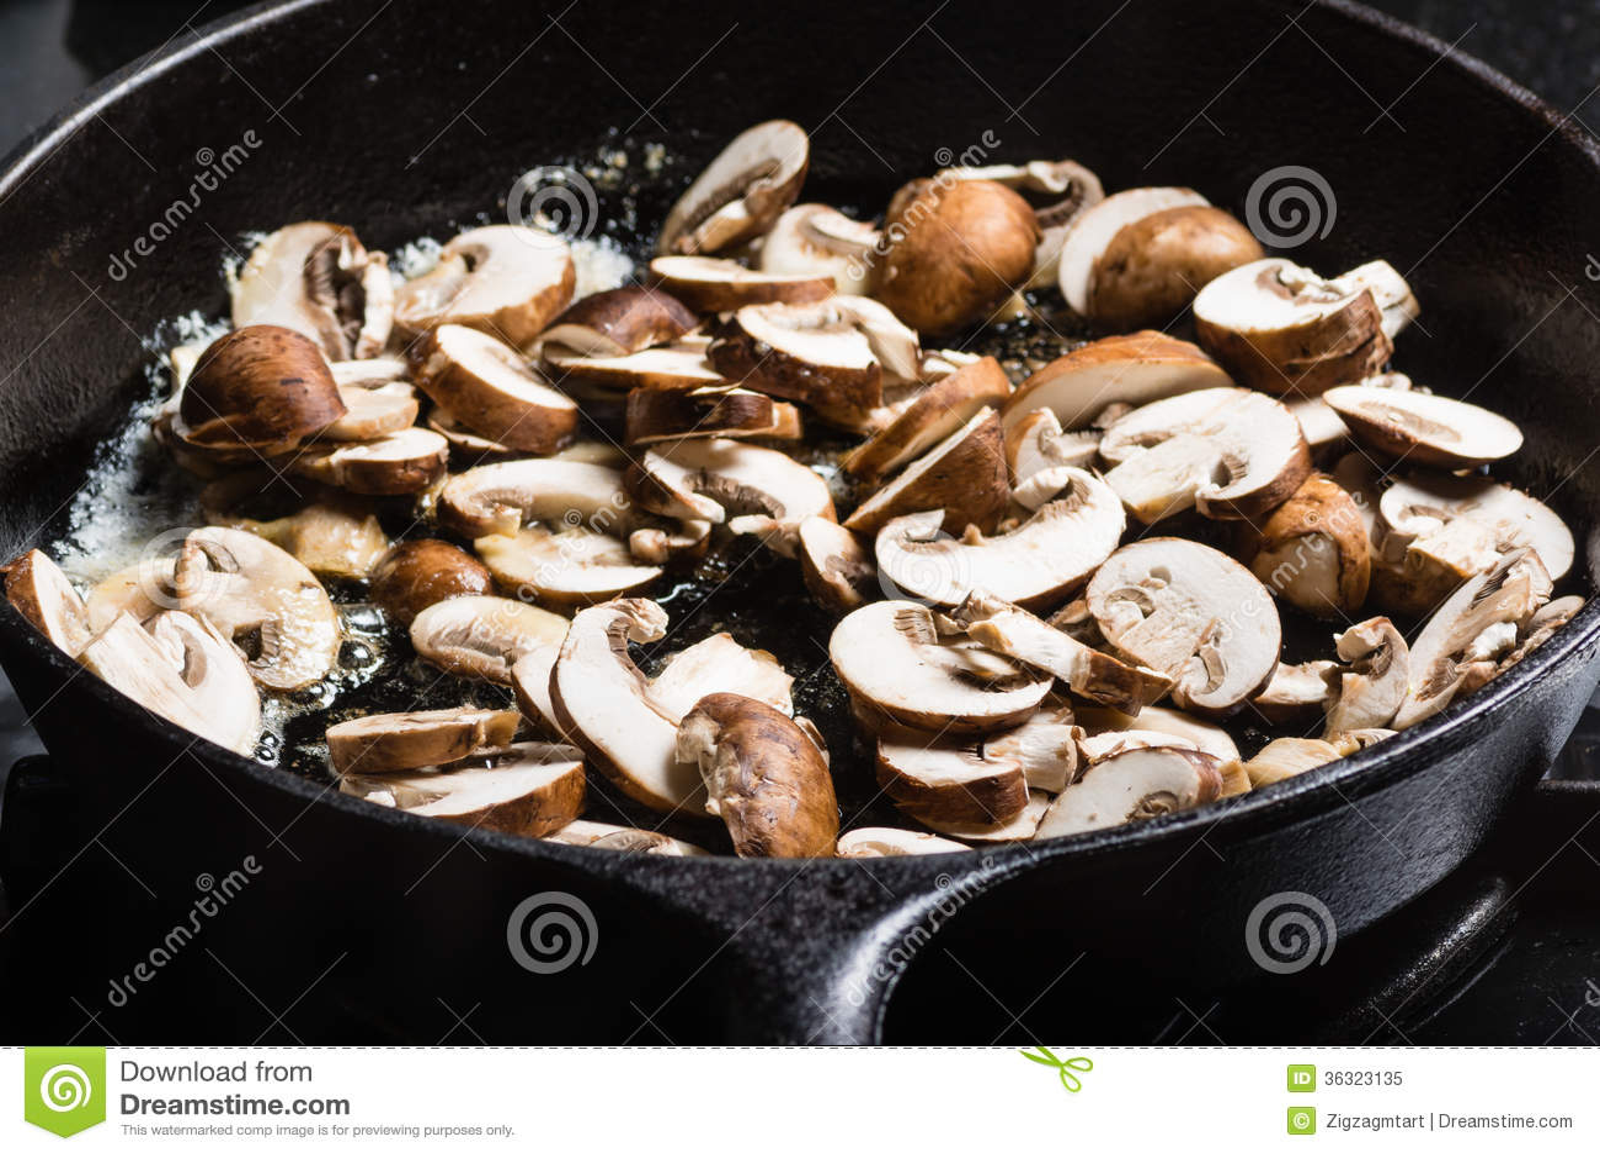 cast iron stew pot on cast iron chicken mushroom mushrooms in a cast ...